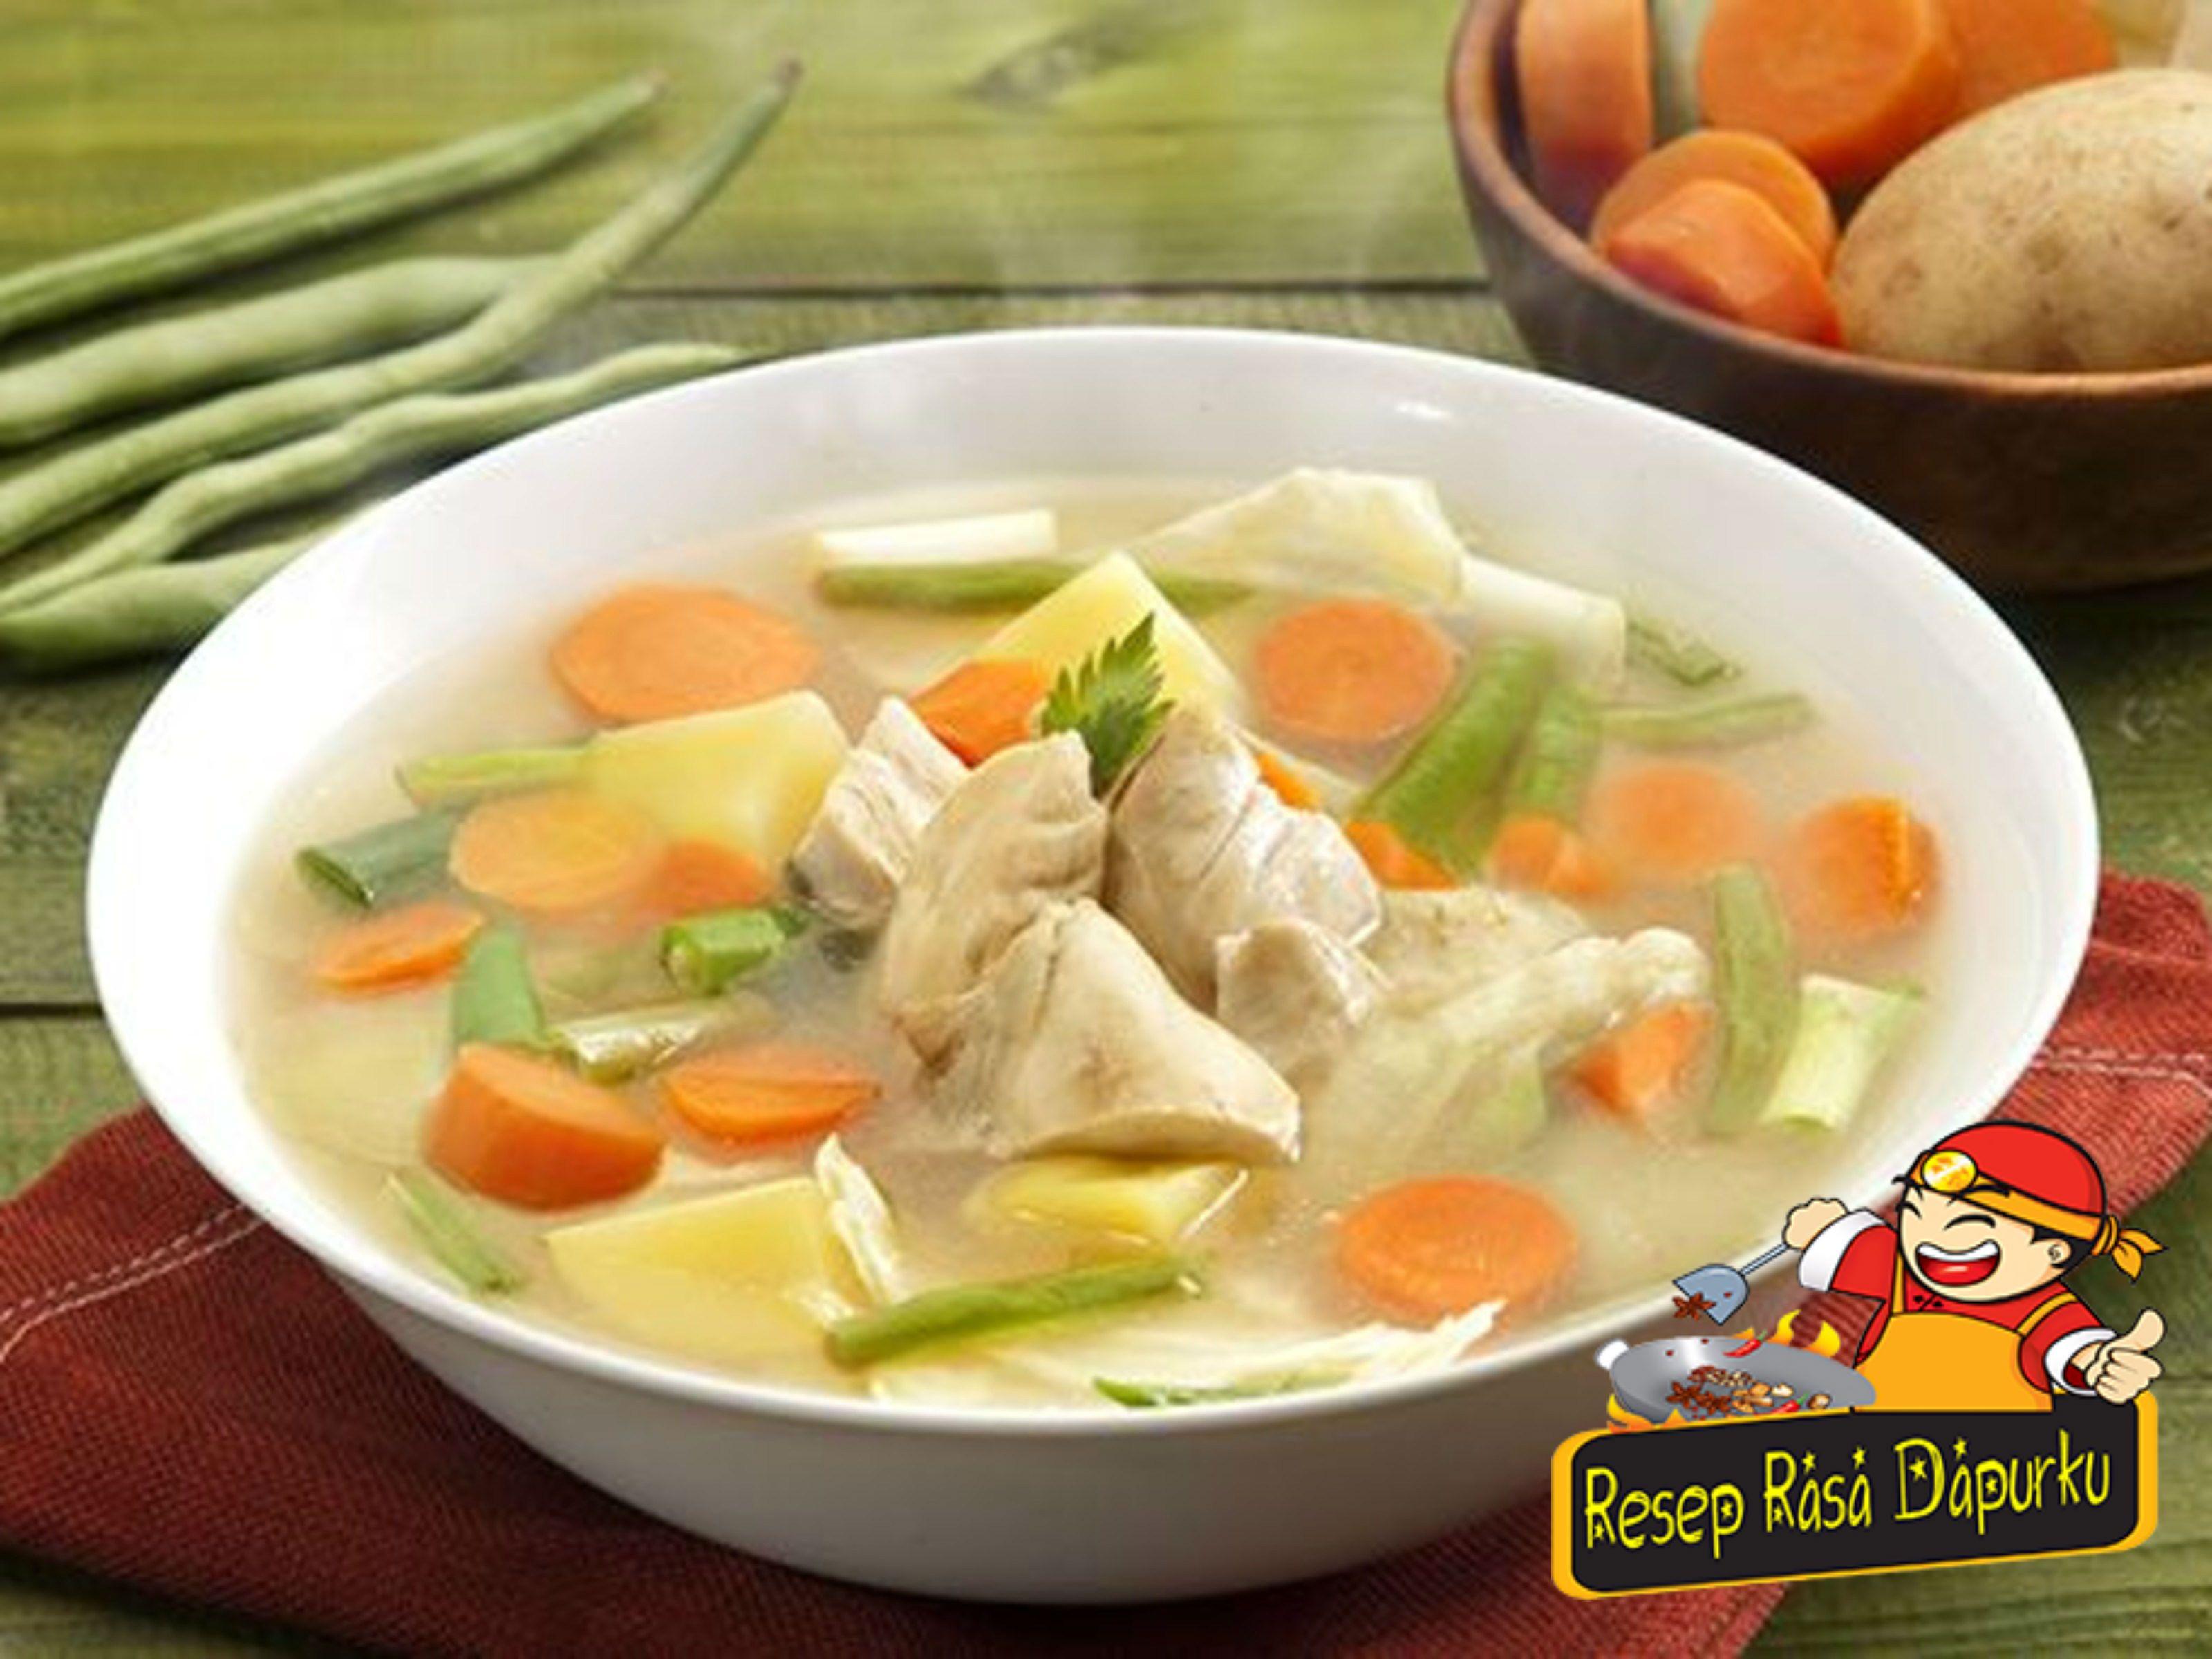 Resep Sup Ayam Bening Yang Enak Seafood Recipes Easy Mac N Cheese Recipe Food